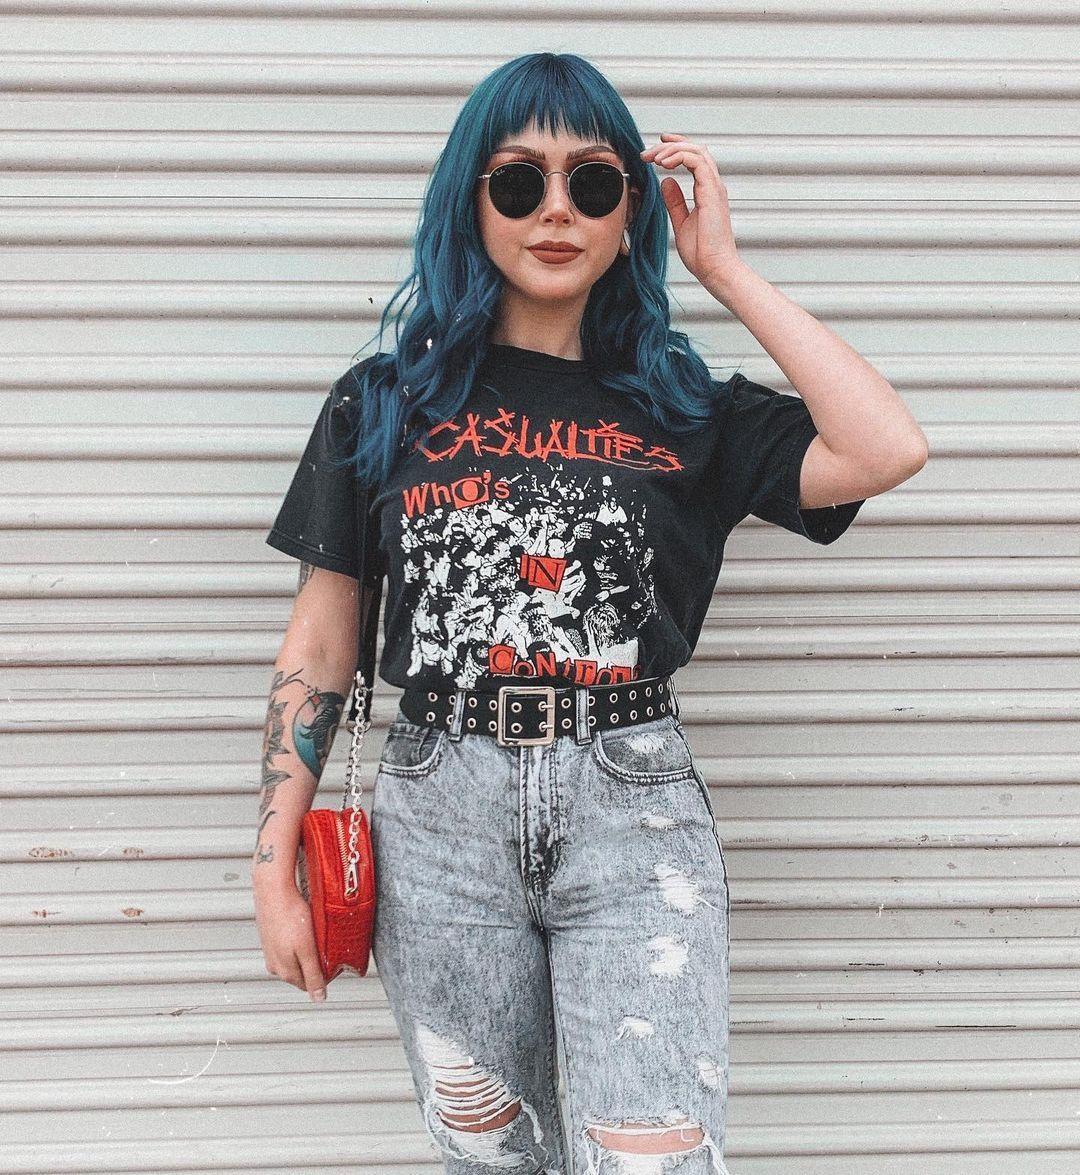 ˗ˏˋ@𝒘𝒊𝒍𝒅𝒇𝑰𝒆𝒖𝒓ˎˊ˗   Alternative fashion, Fashion inspo